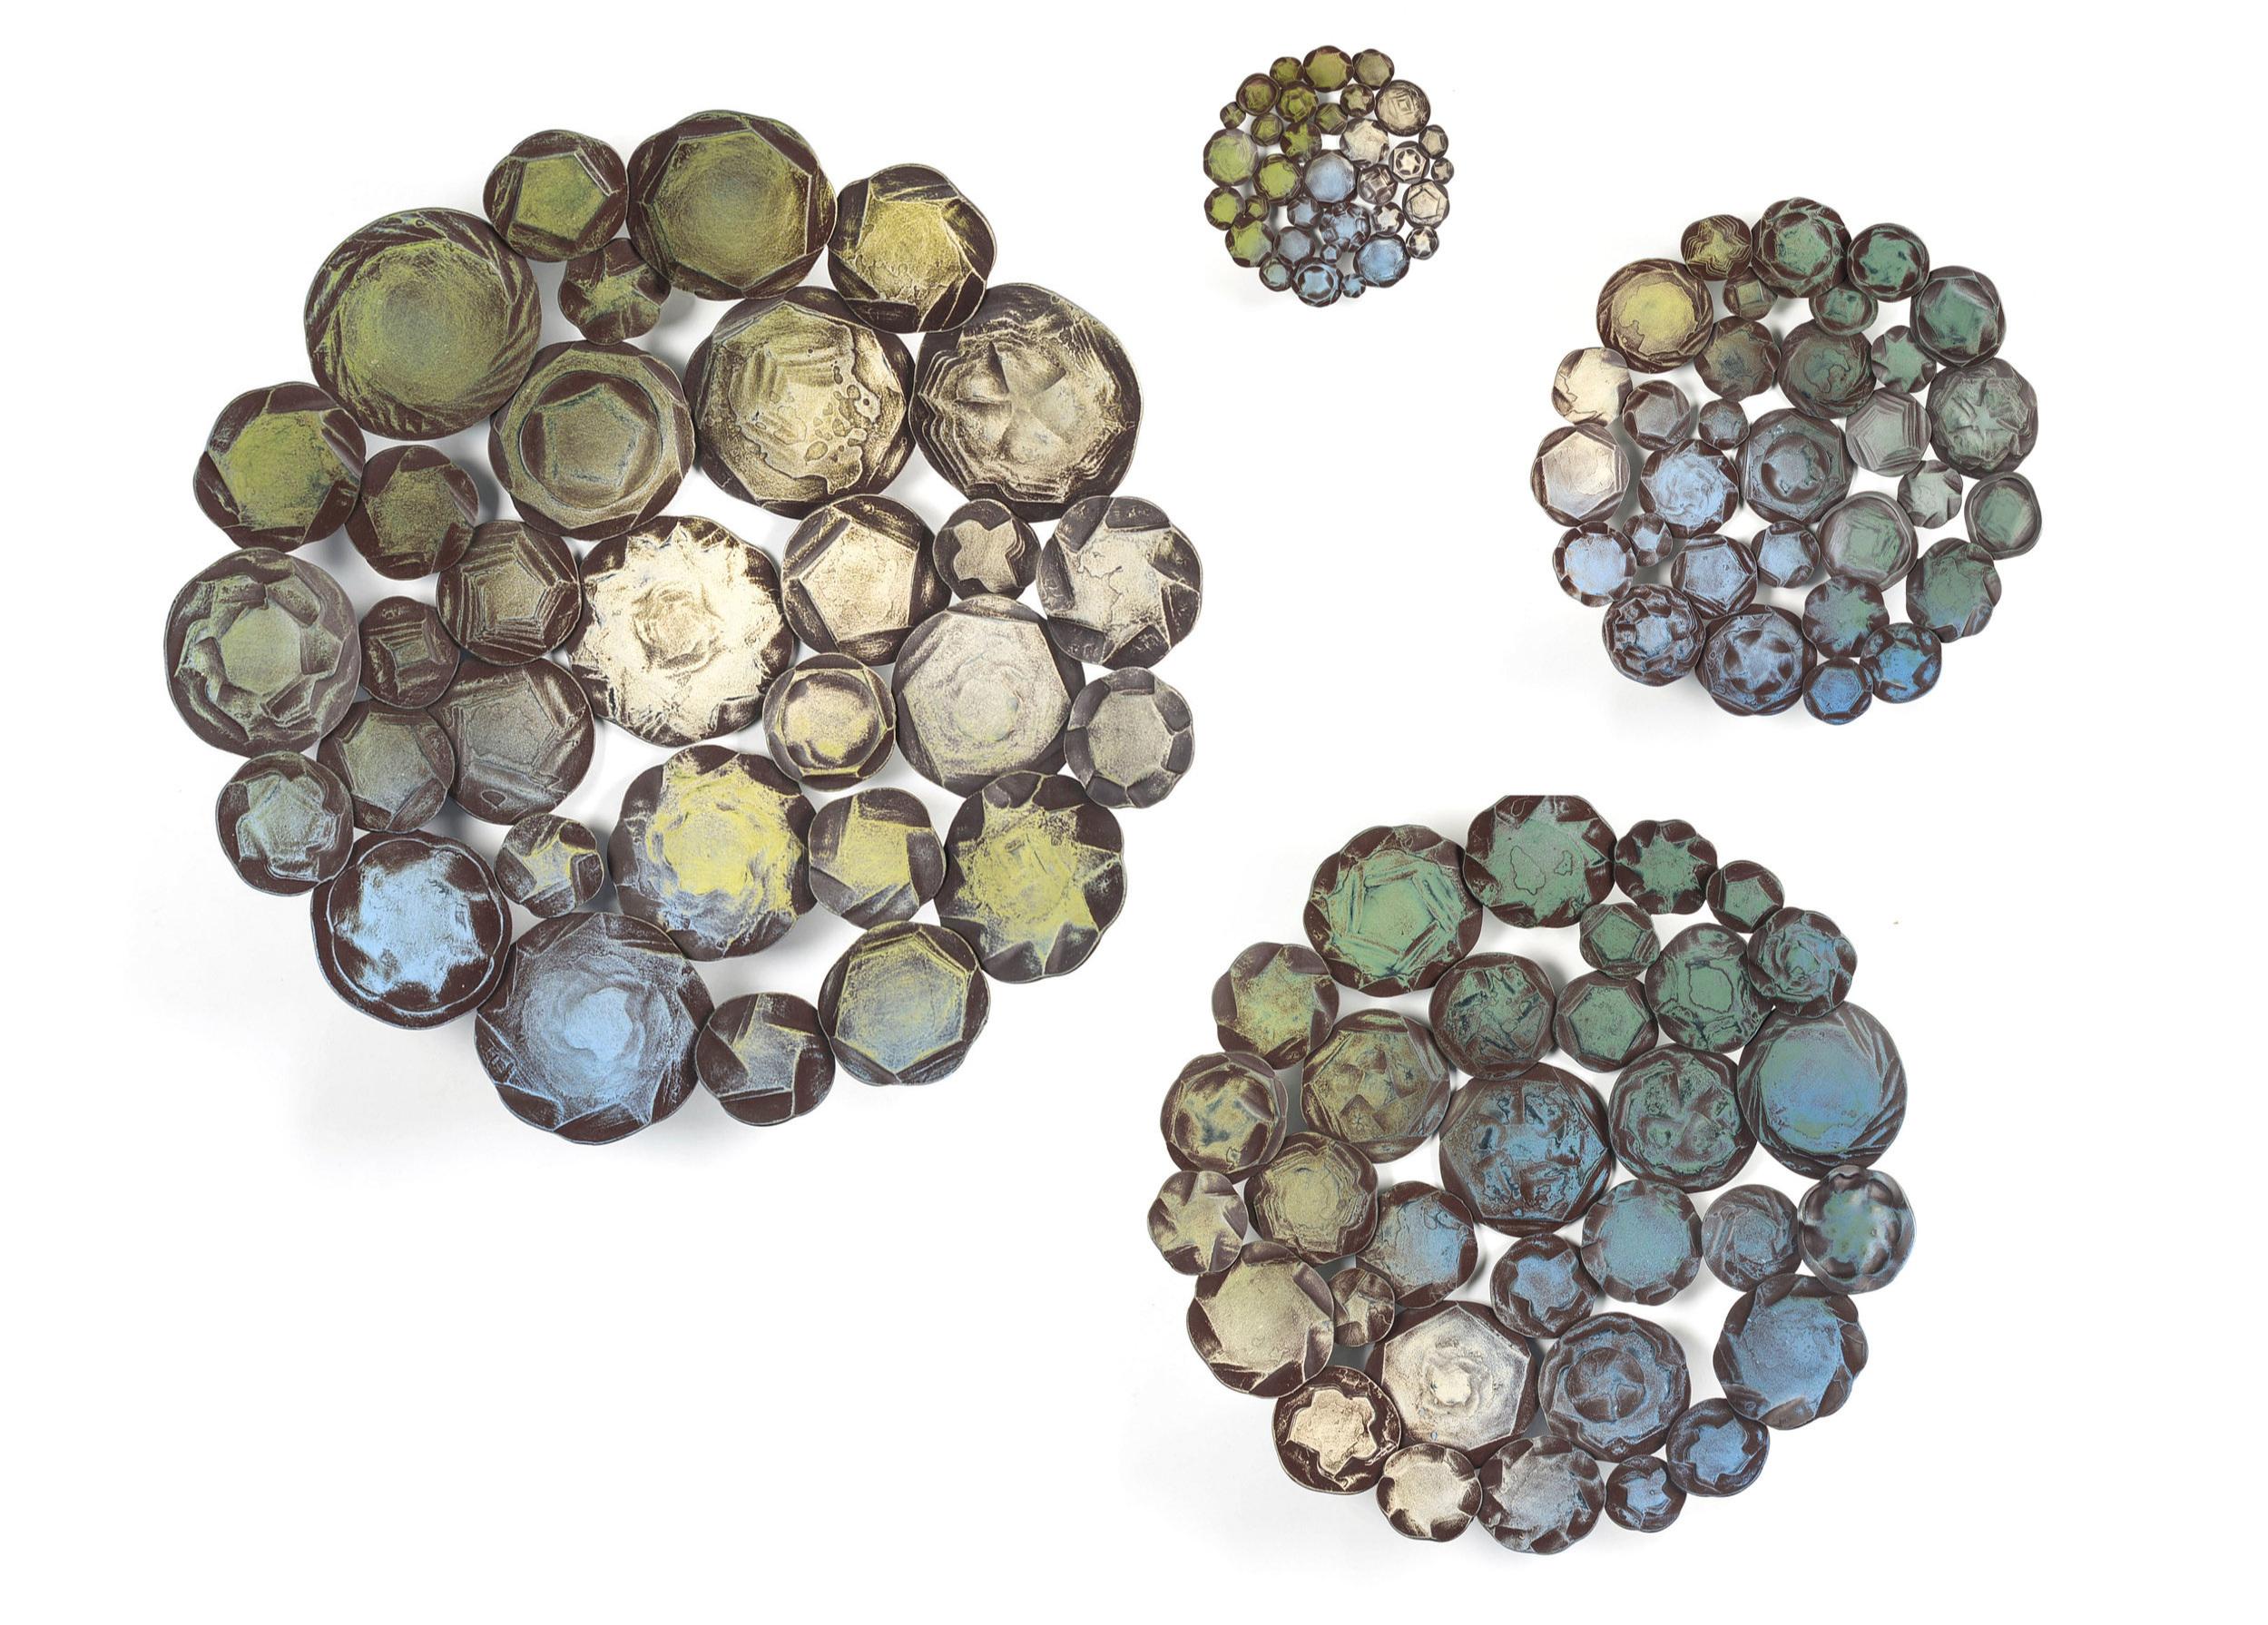 Cyanobacteria_007.jpg